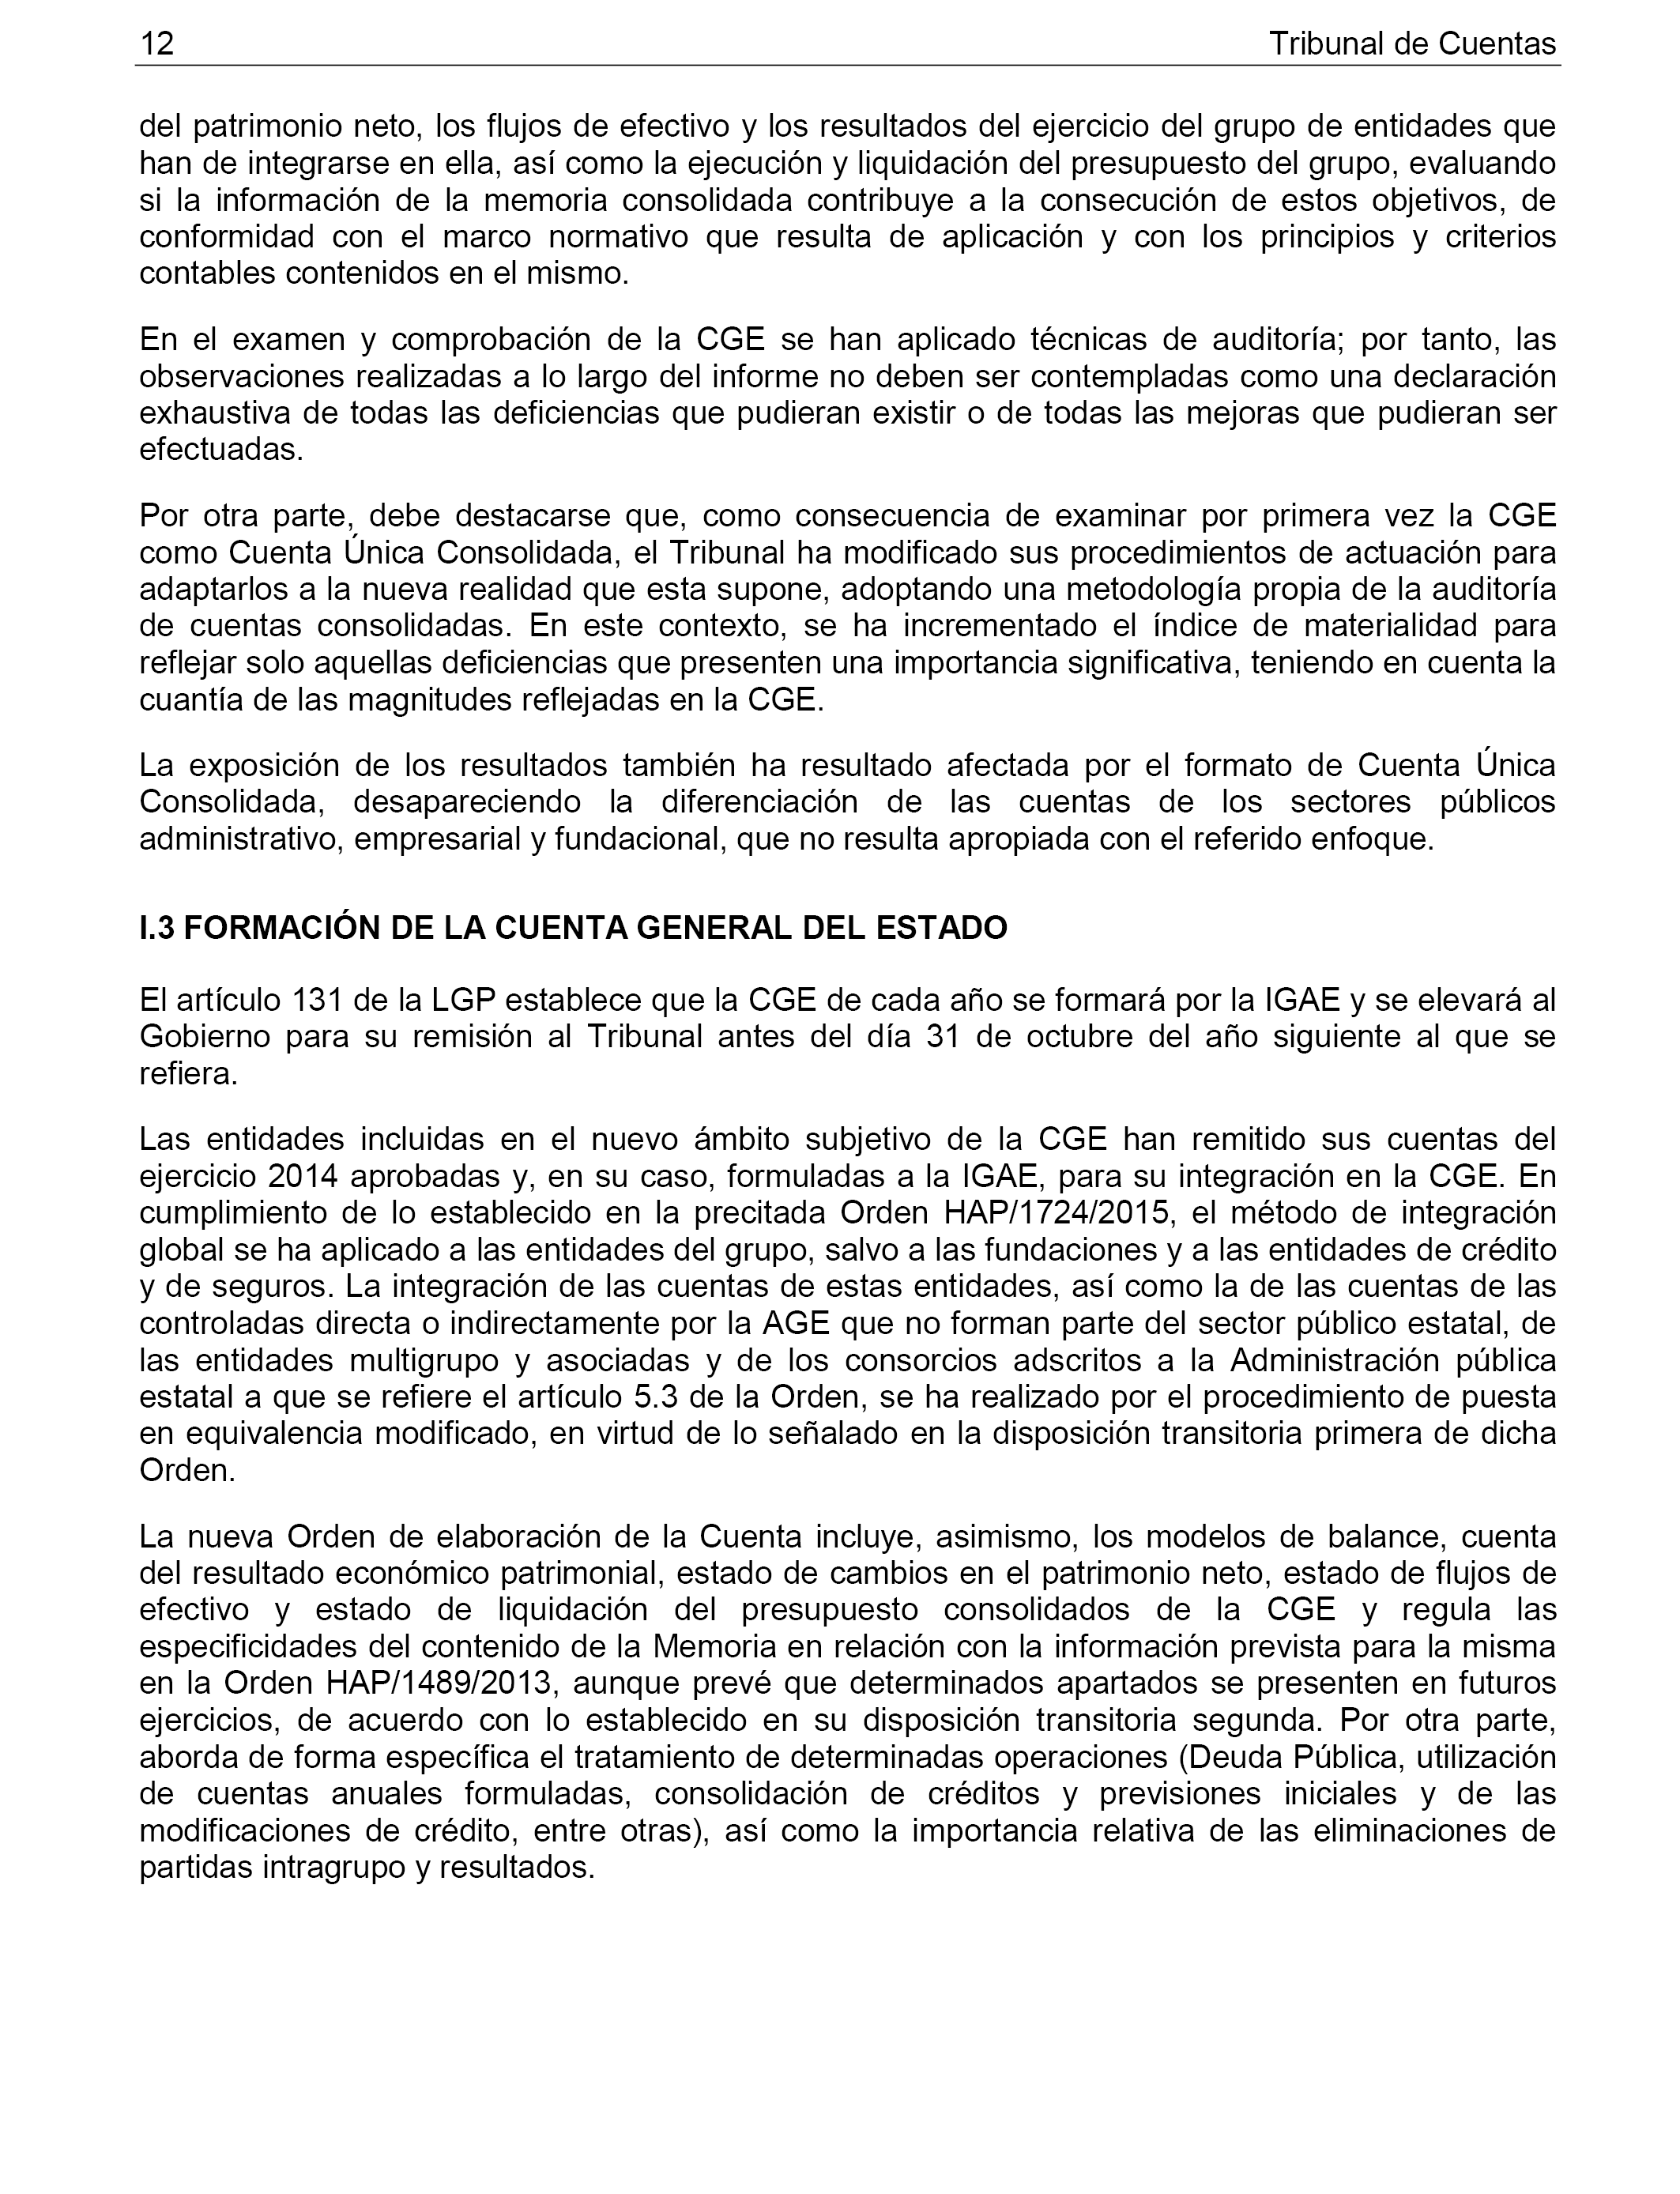 BOE.es - Documento BOE-A-2017-4710